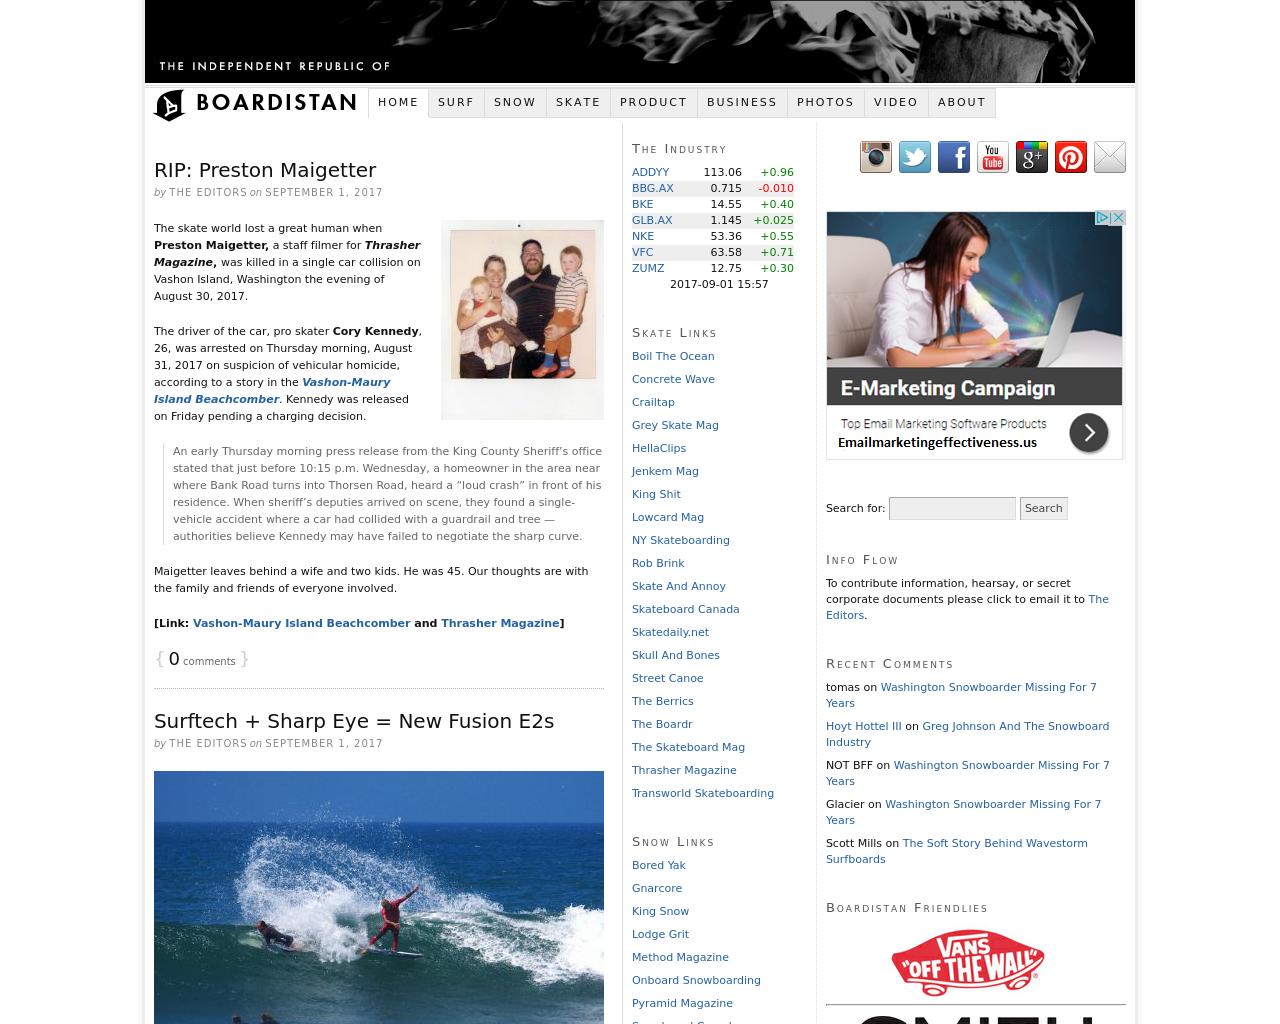 boardistan.com-Advertising-Reviews-Pricing